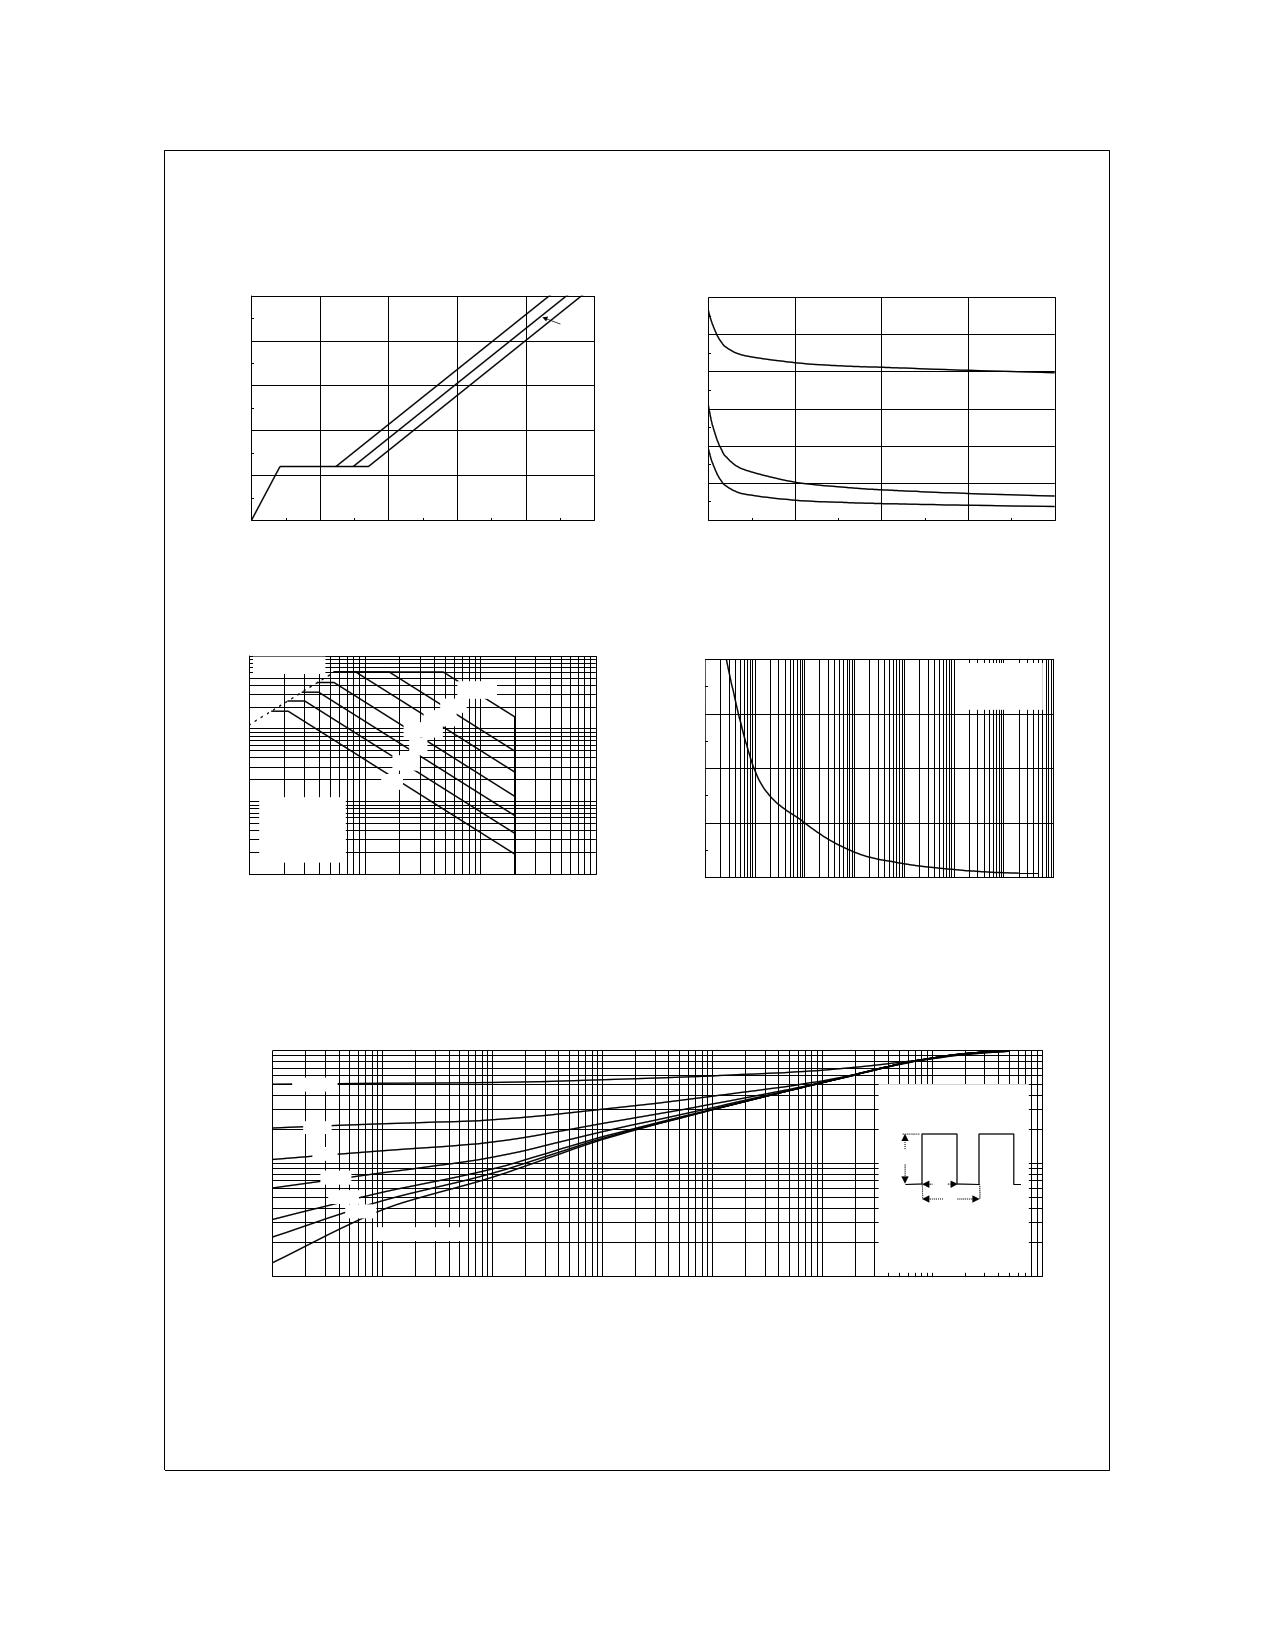 FDG327NZ pdf, 반도체, 판매, 대치품